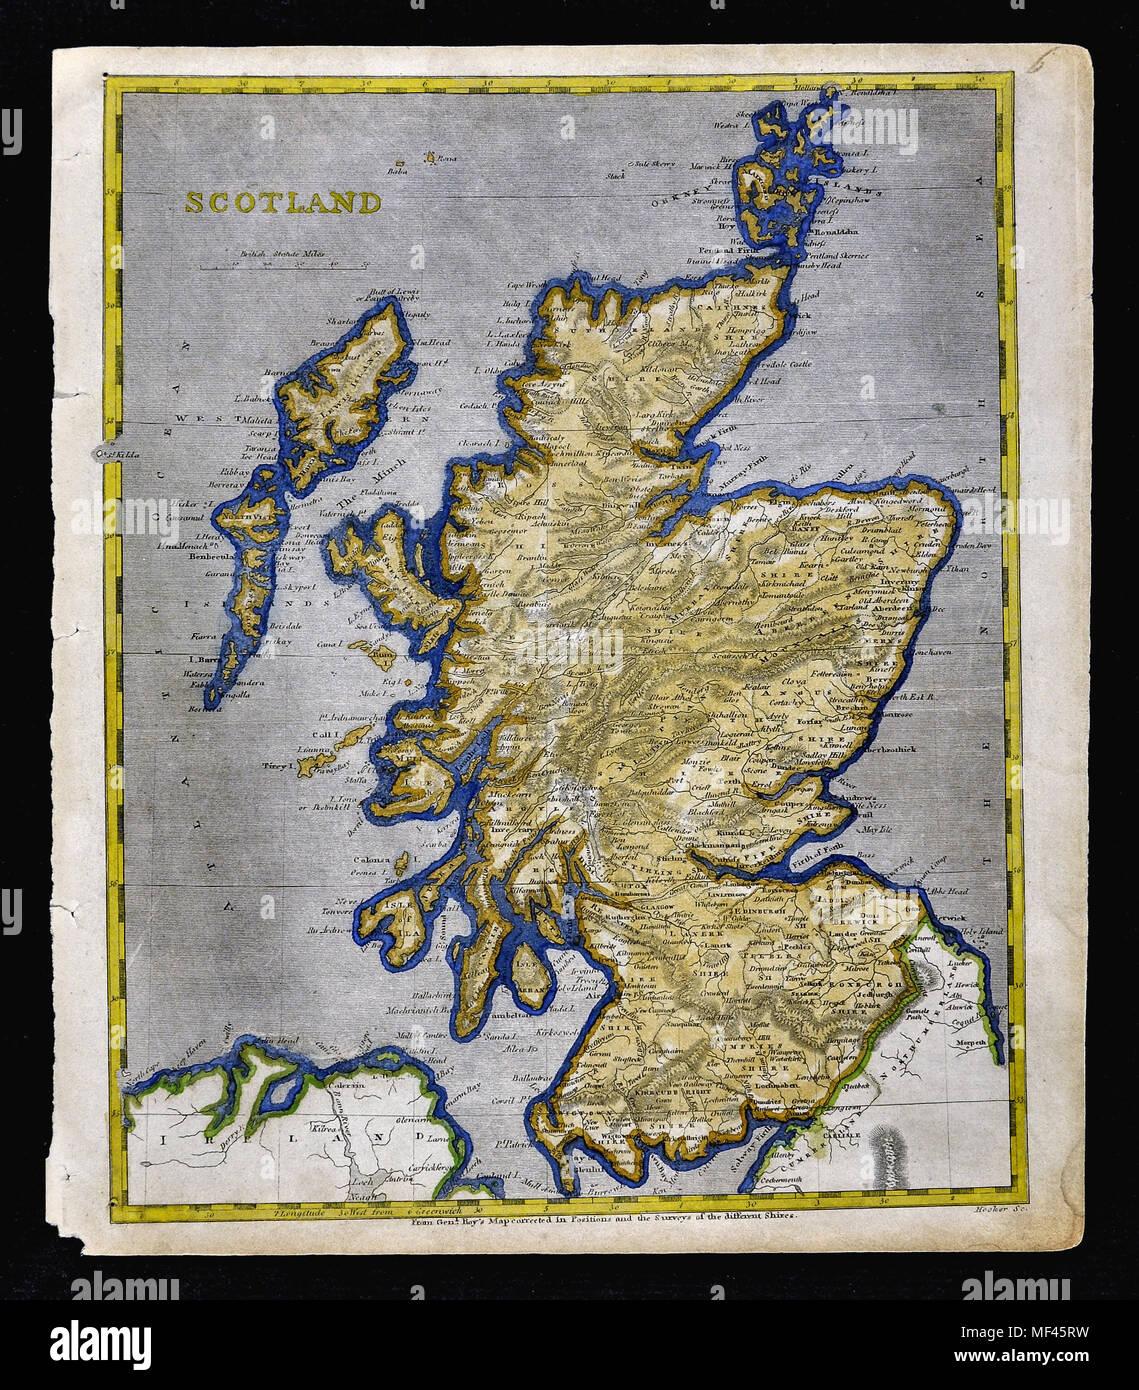 Loch Ness Karte.1804 Arrowsmith Karte Schottland Edinburgh Glasgow Loch Ness